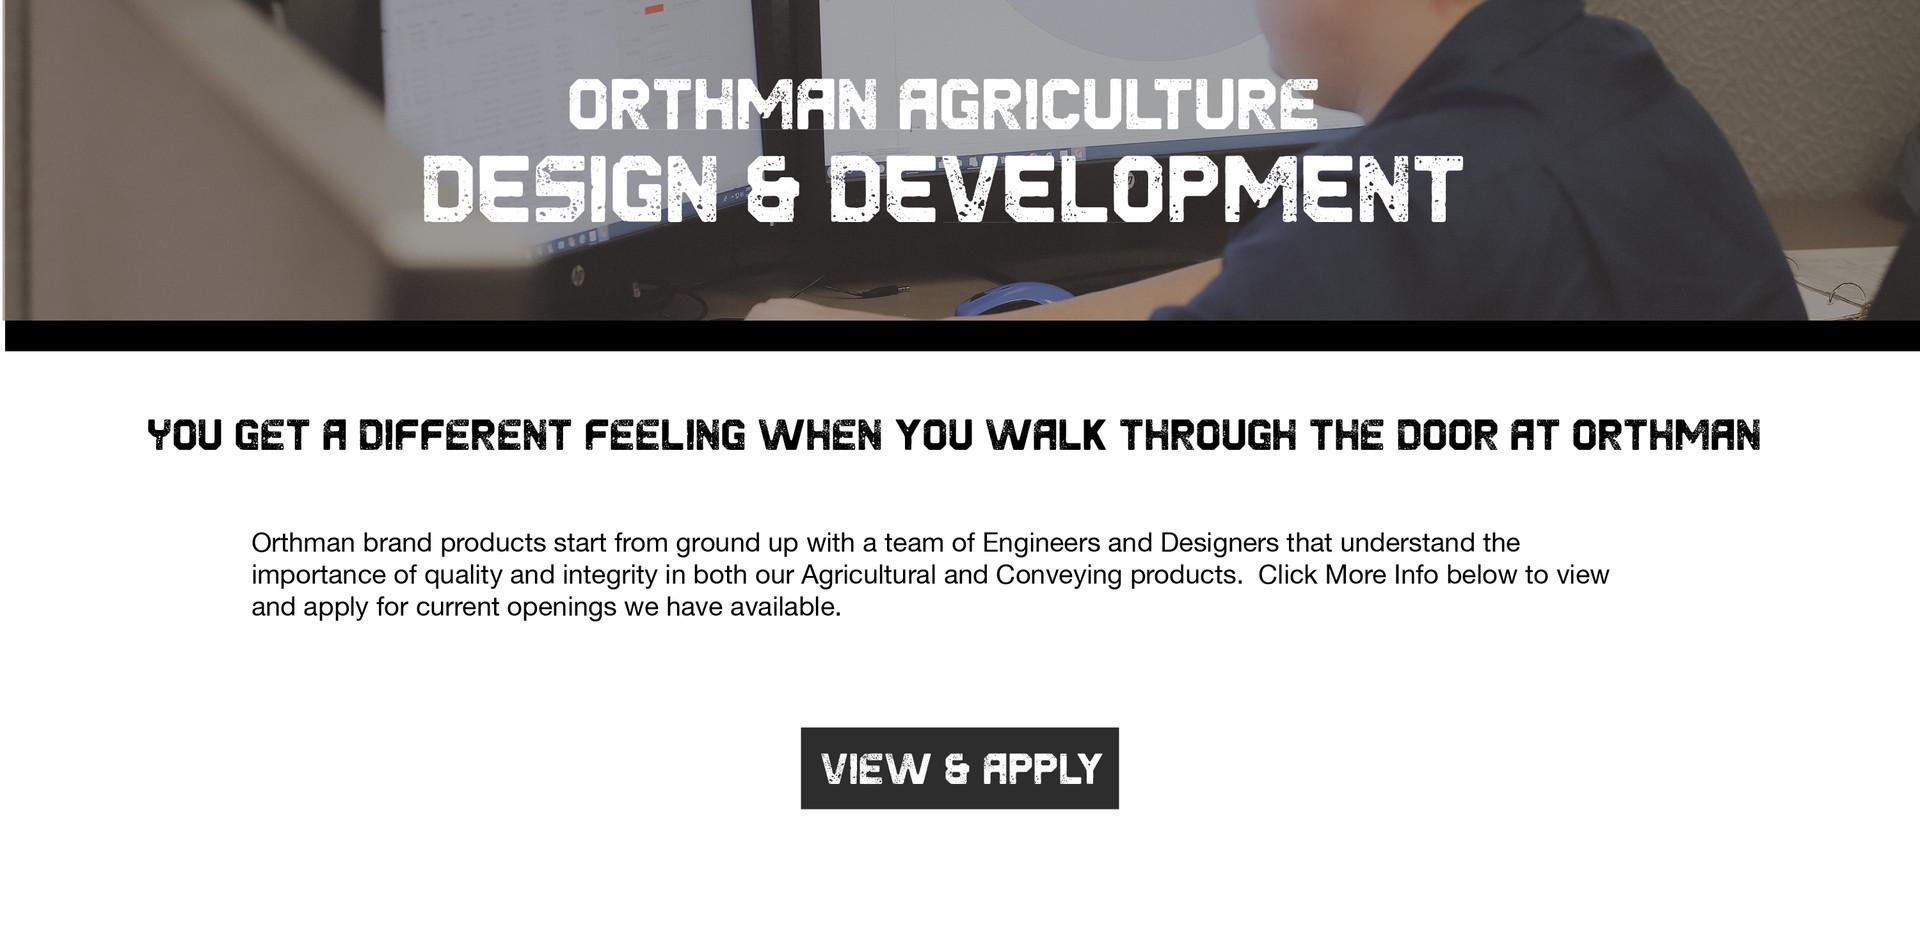 OMI_Careers_Design_Development.jpg